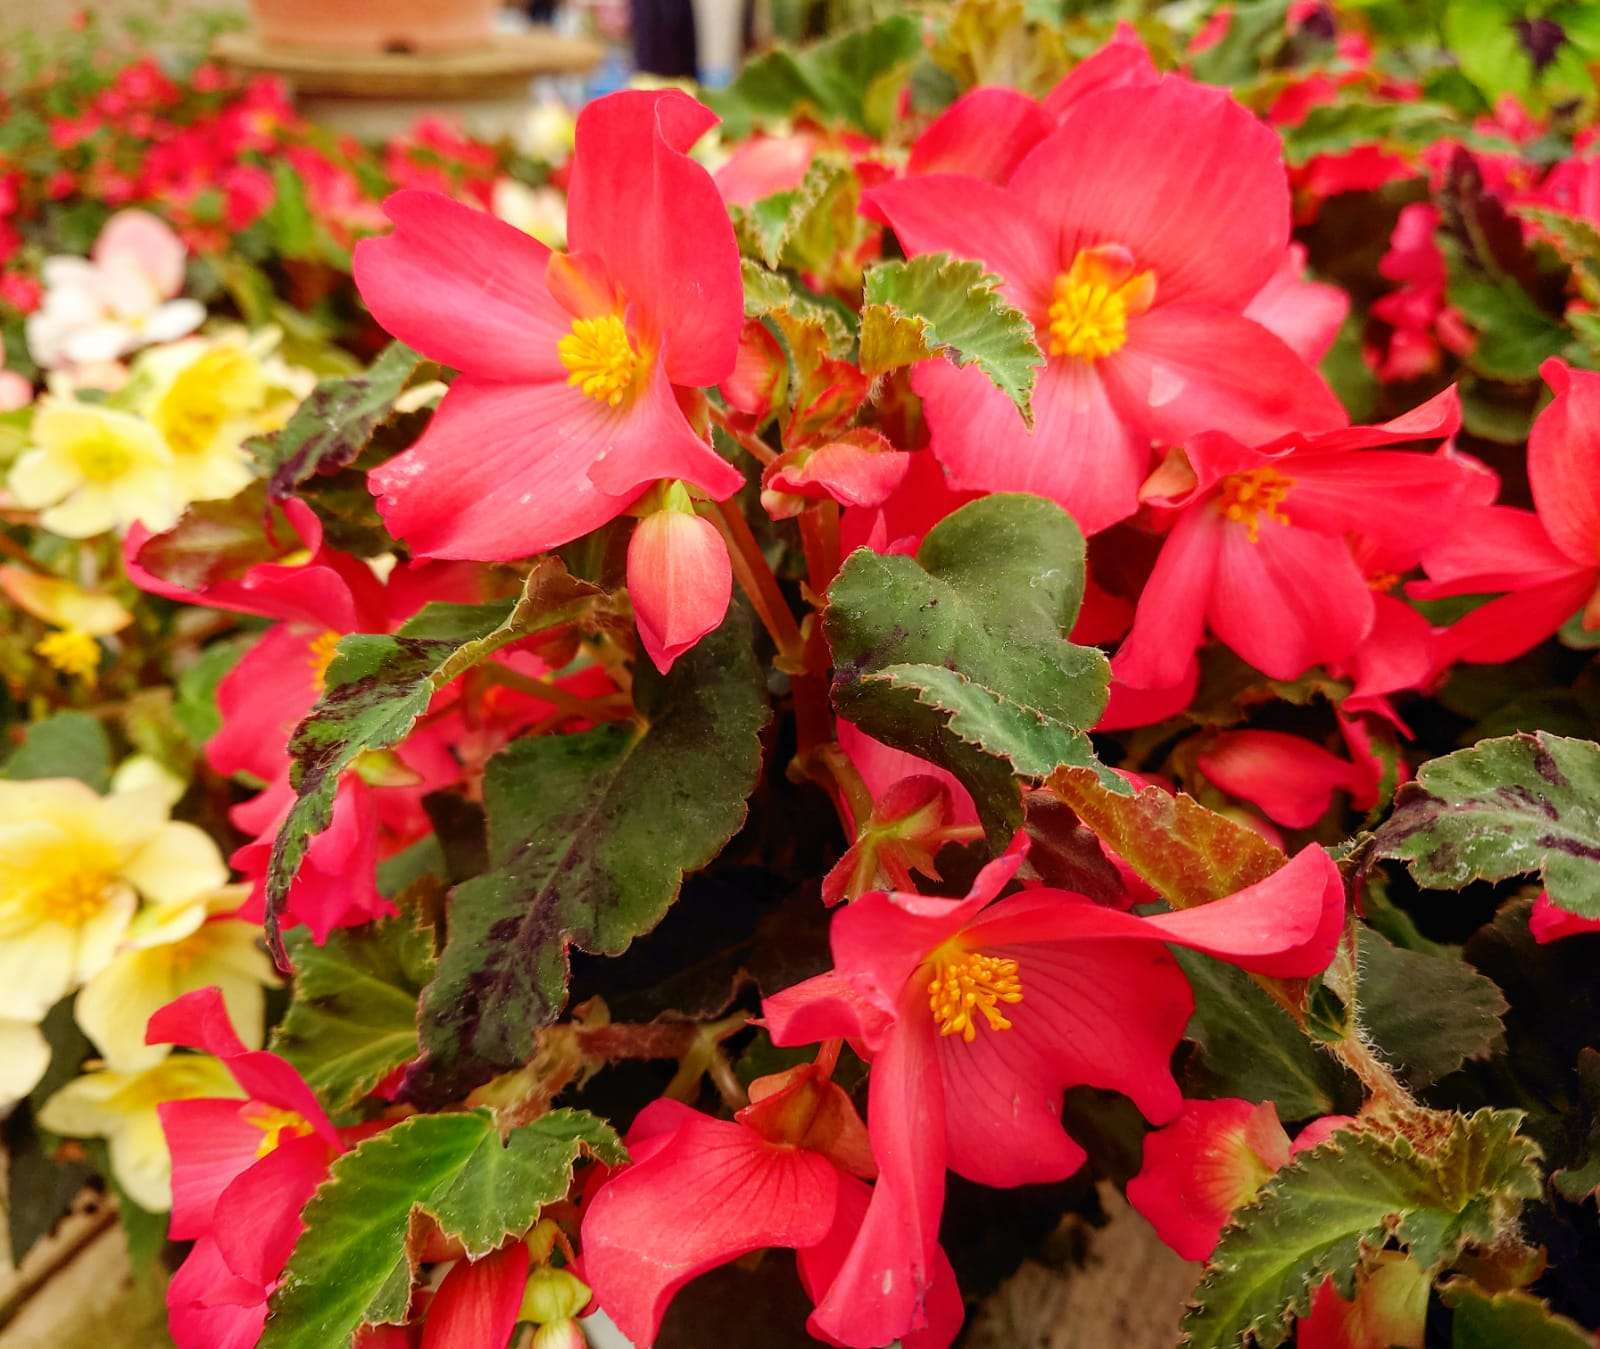 Begonia tuberhydrida